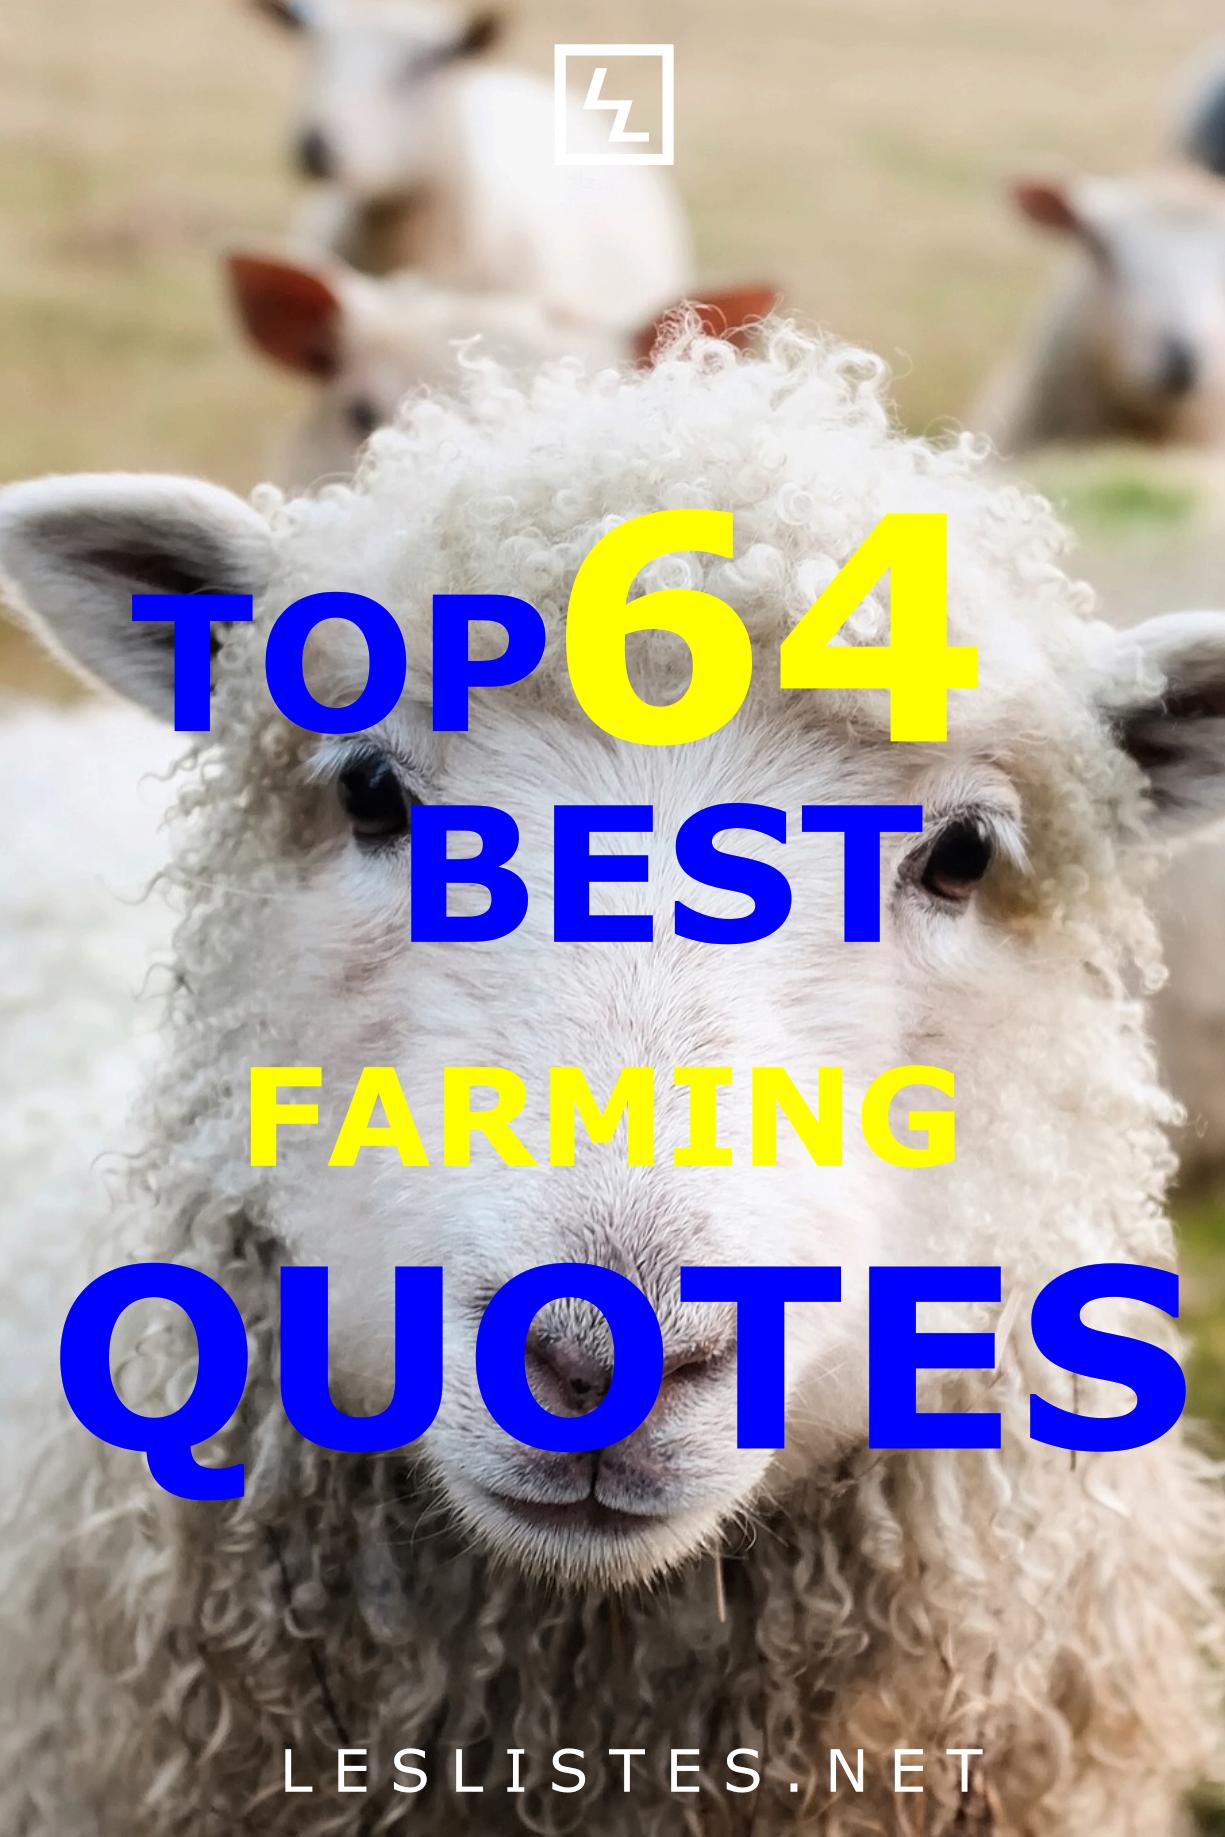 Top 64 Farming Quotes That You Should Know (avec images)